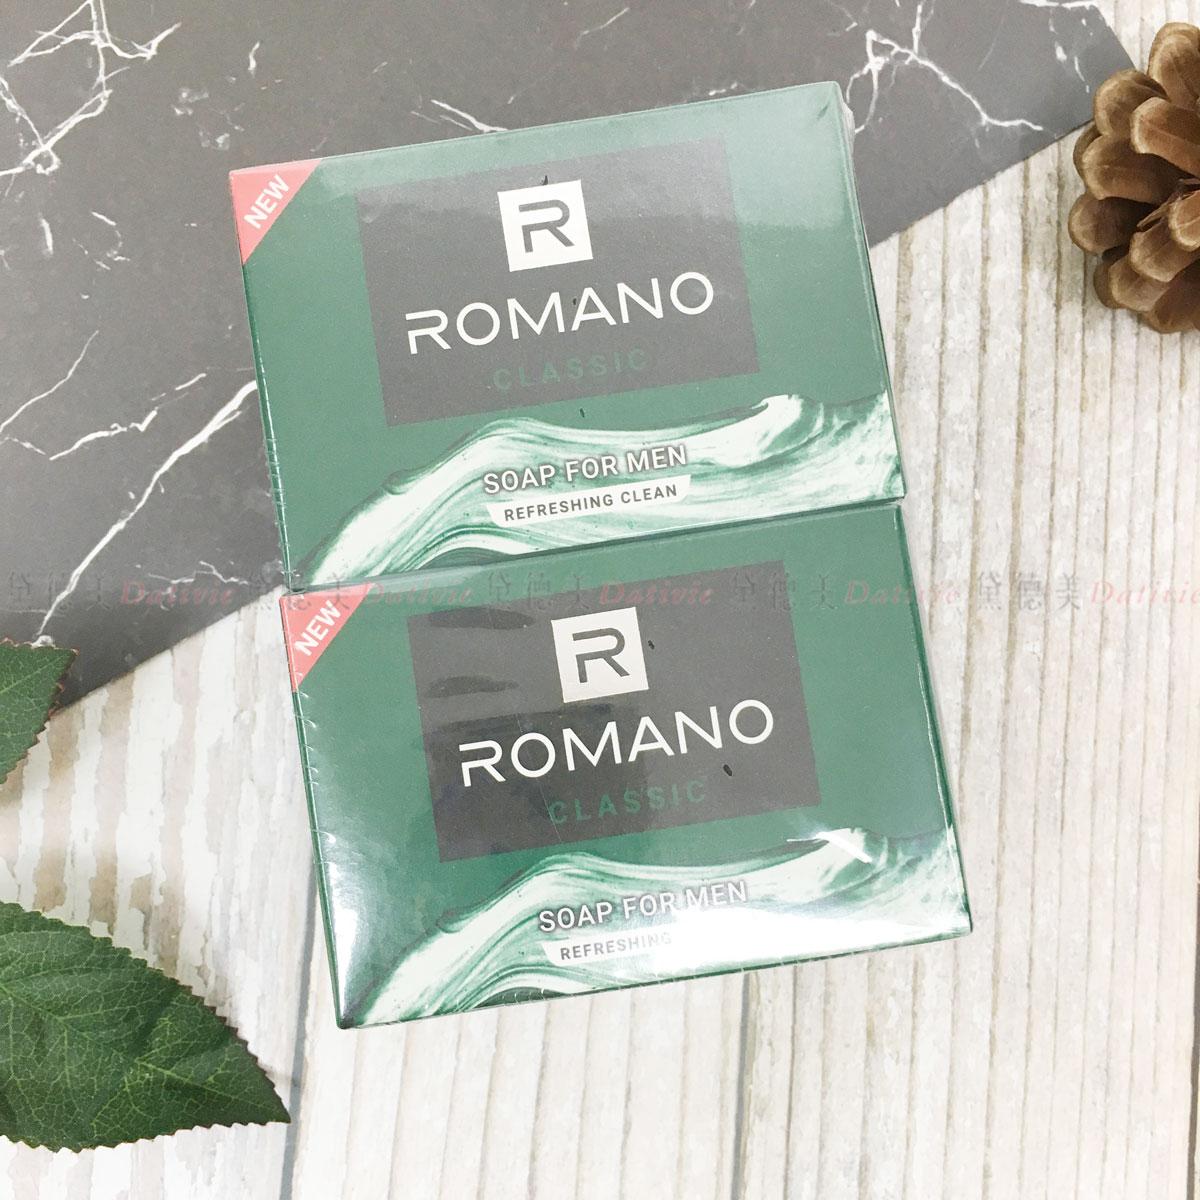 ROMANO 男性香精經典潤膚香皂 四入一組 越南製造